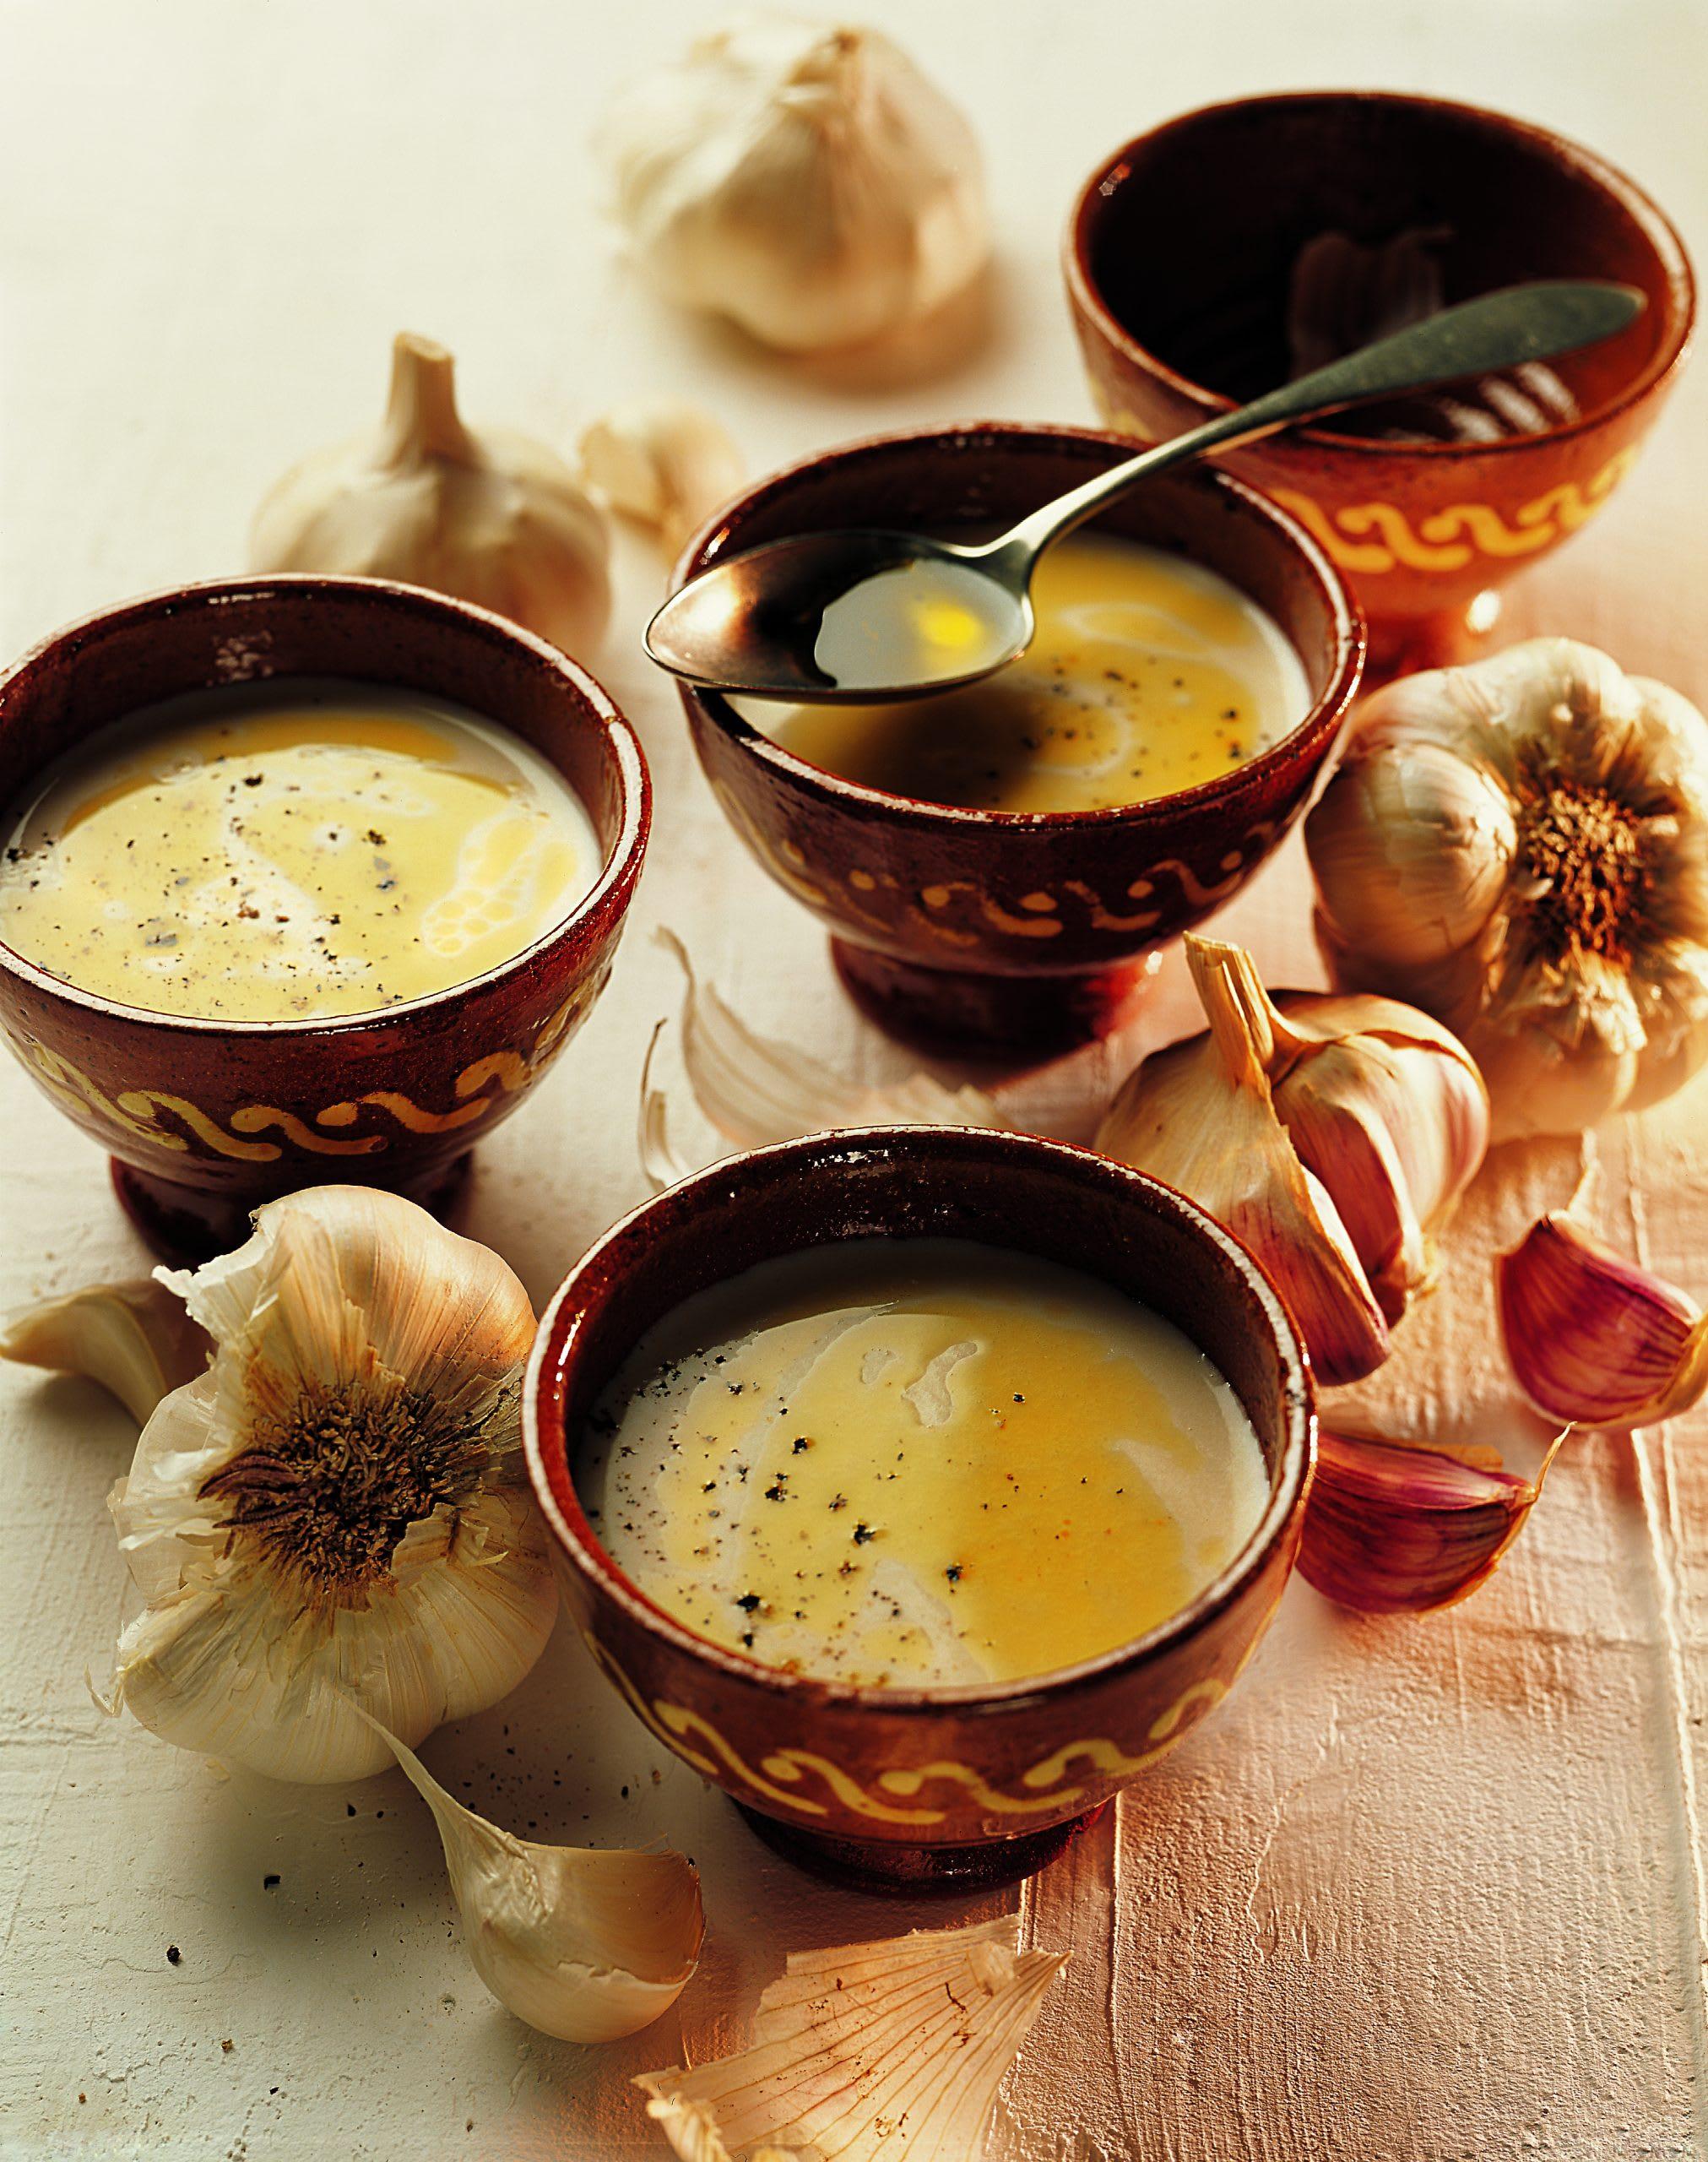 Ajoblanco (Kalte Knoblauch-Mandel-Suppe)